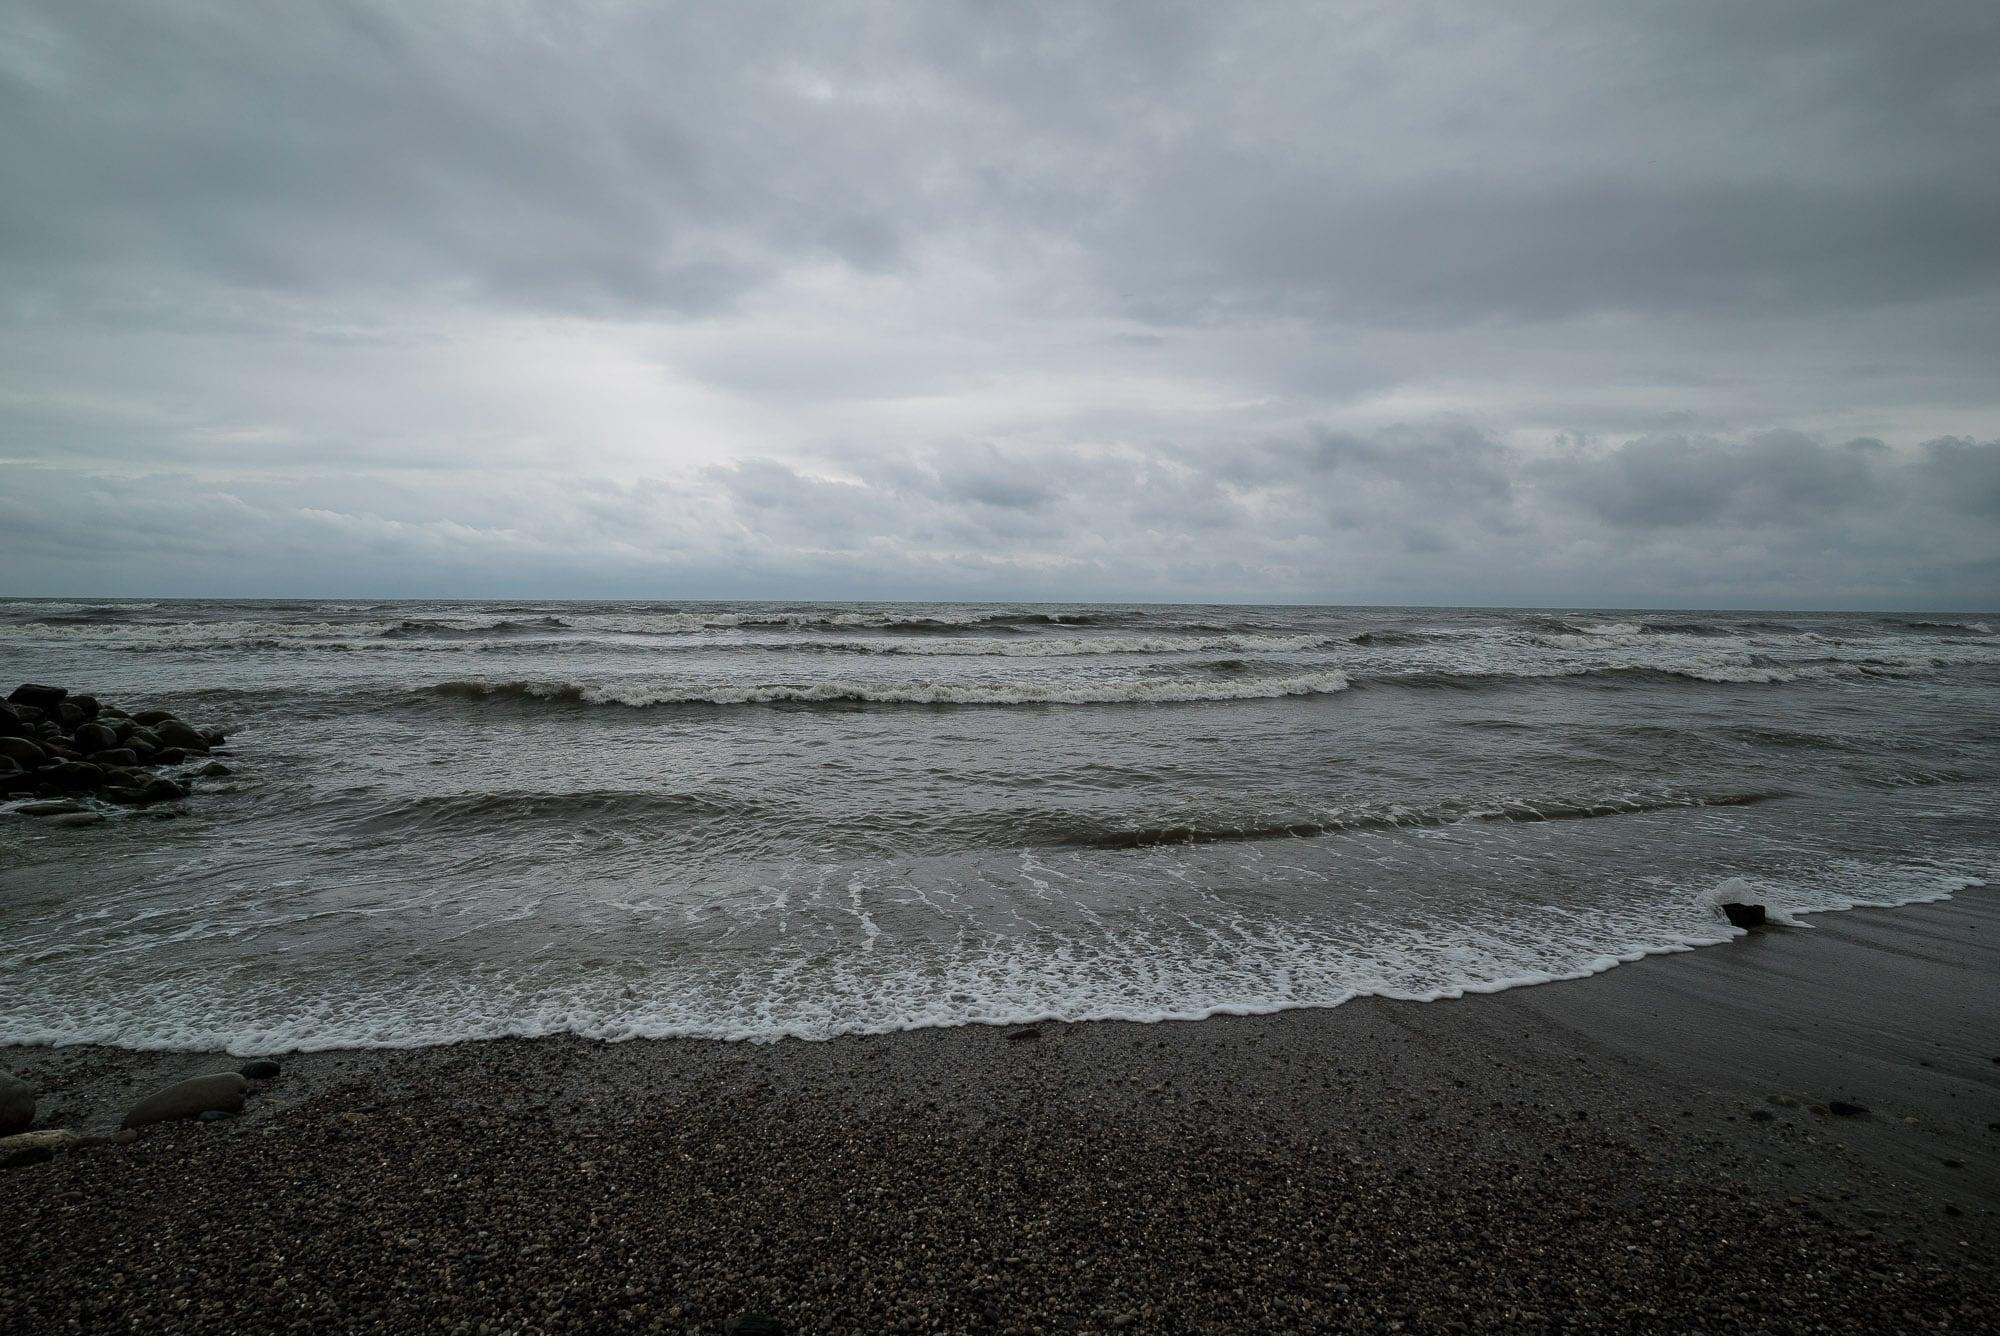 Caspian Sea in the morning